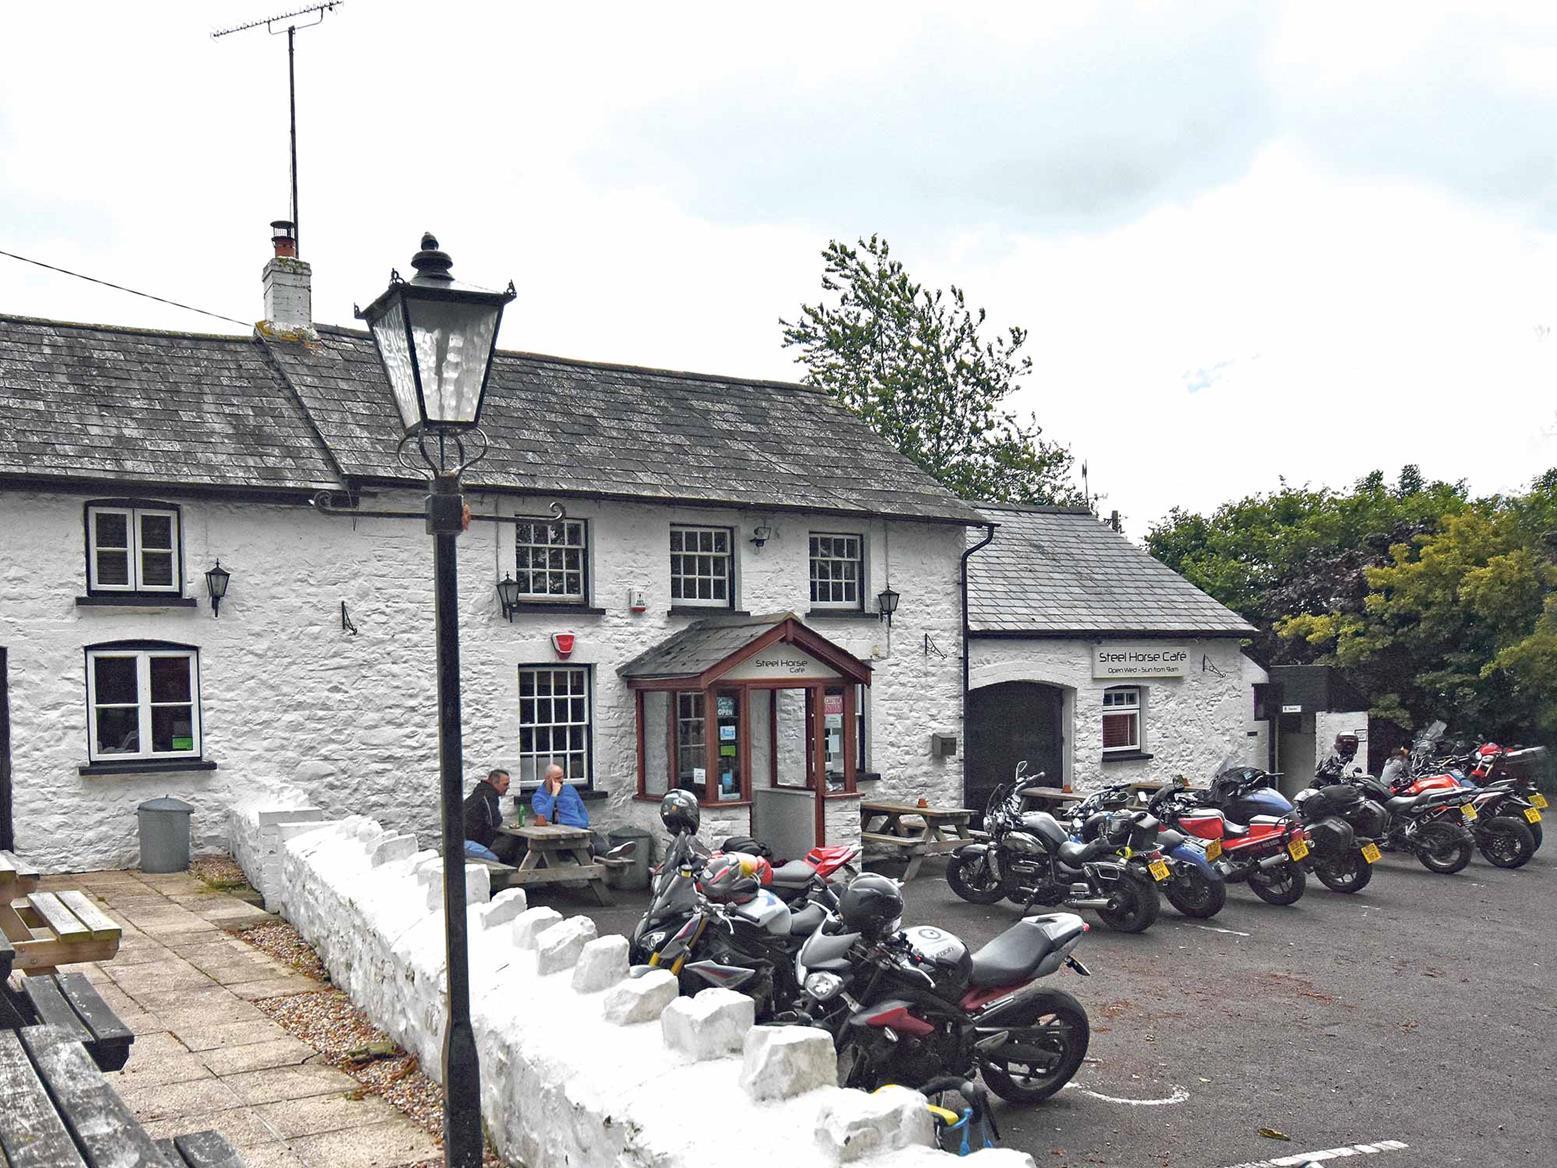 The Steel Horse Café